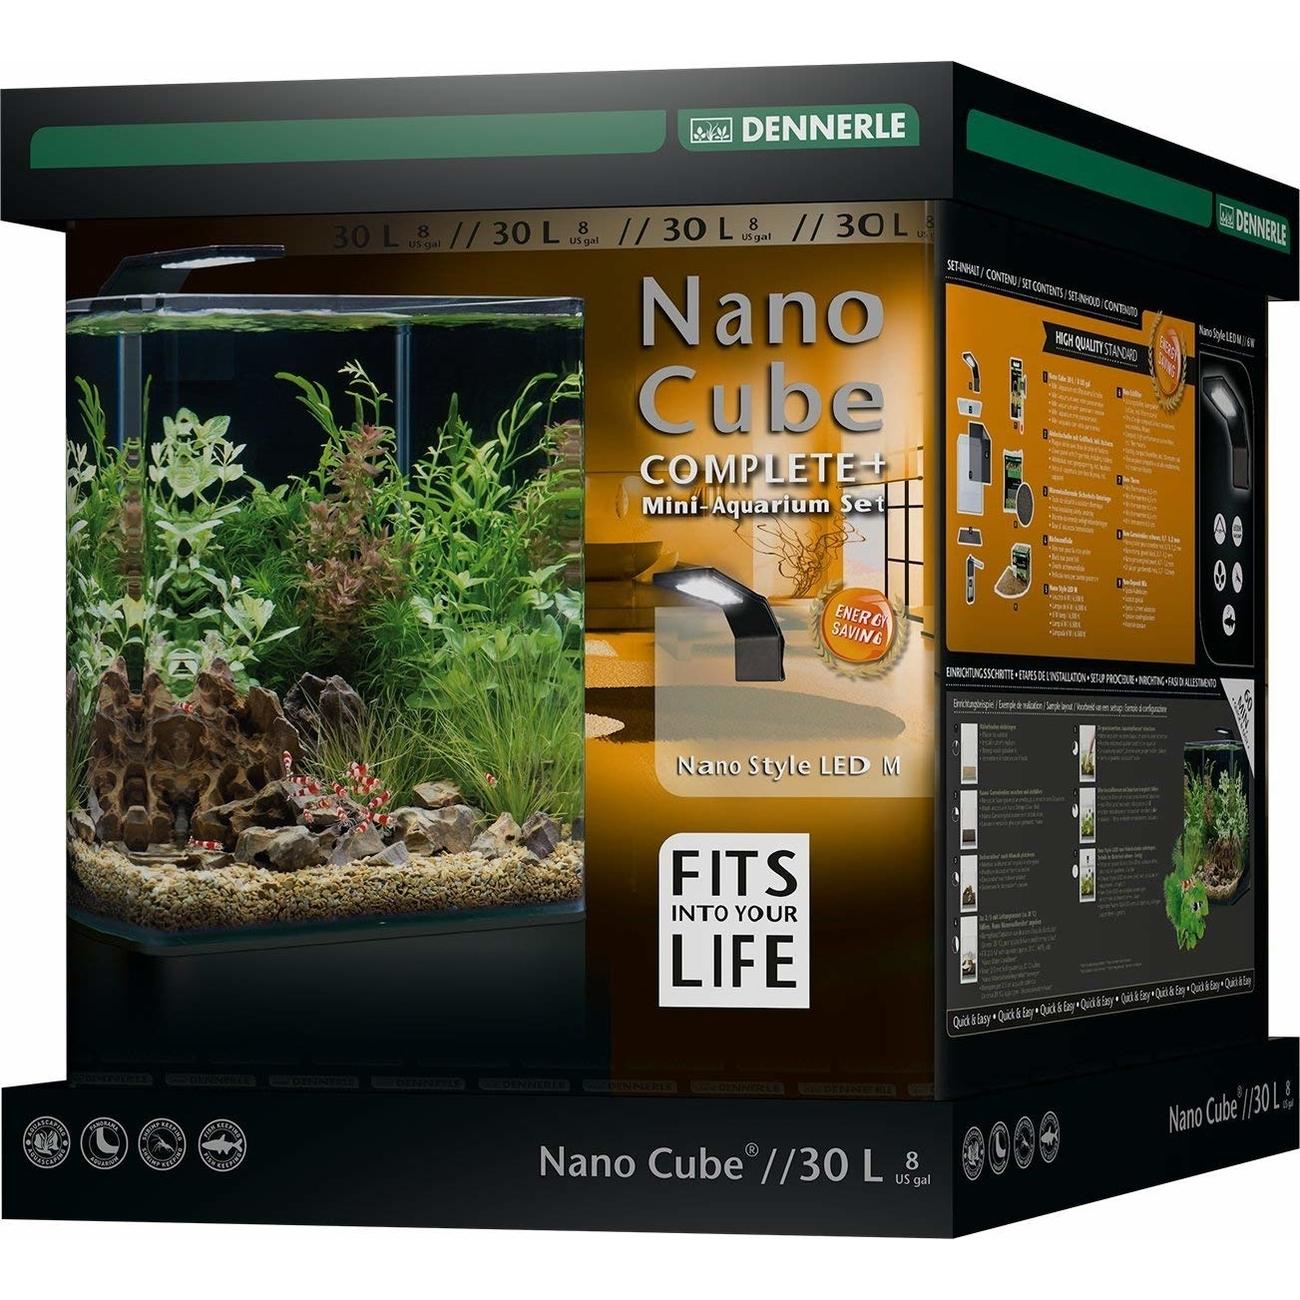 Dennerle NanoCube Complete+ Style LED, Bild 7